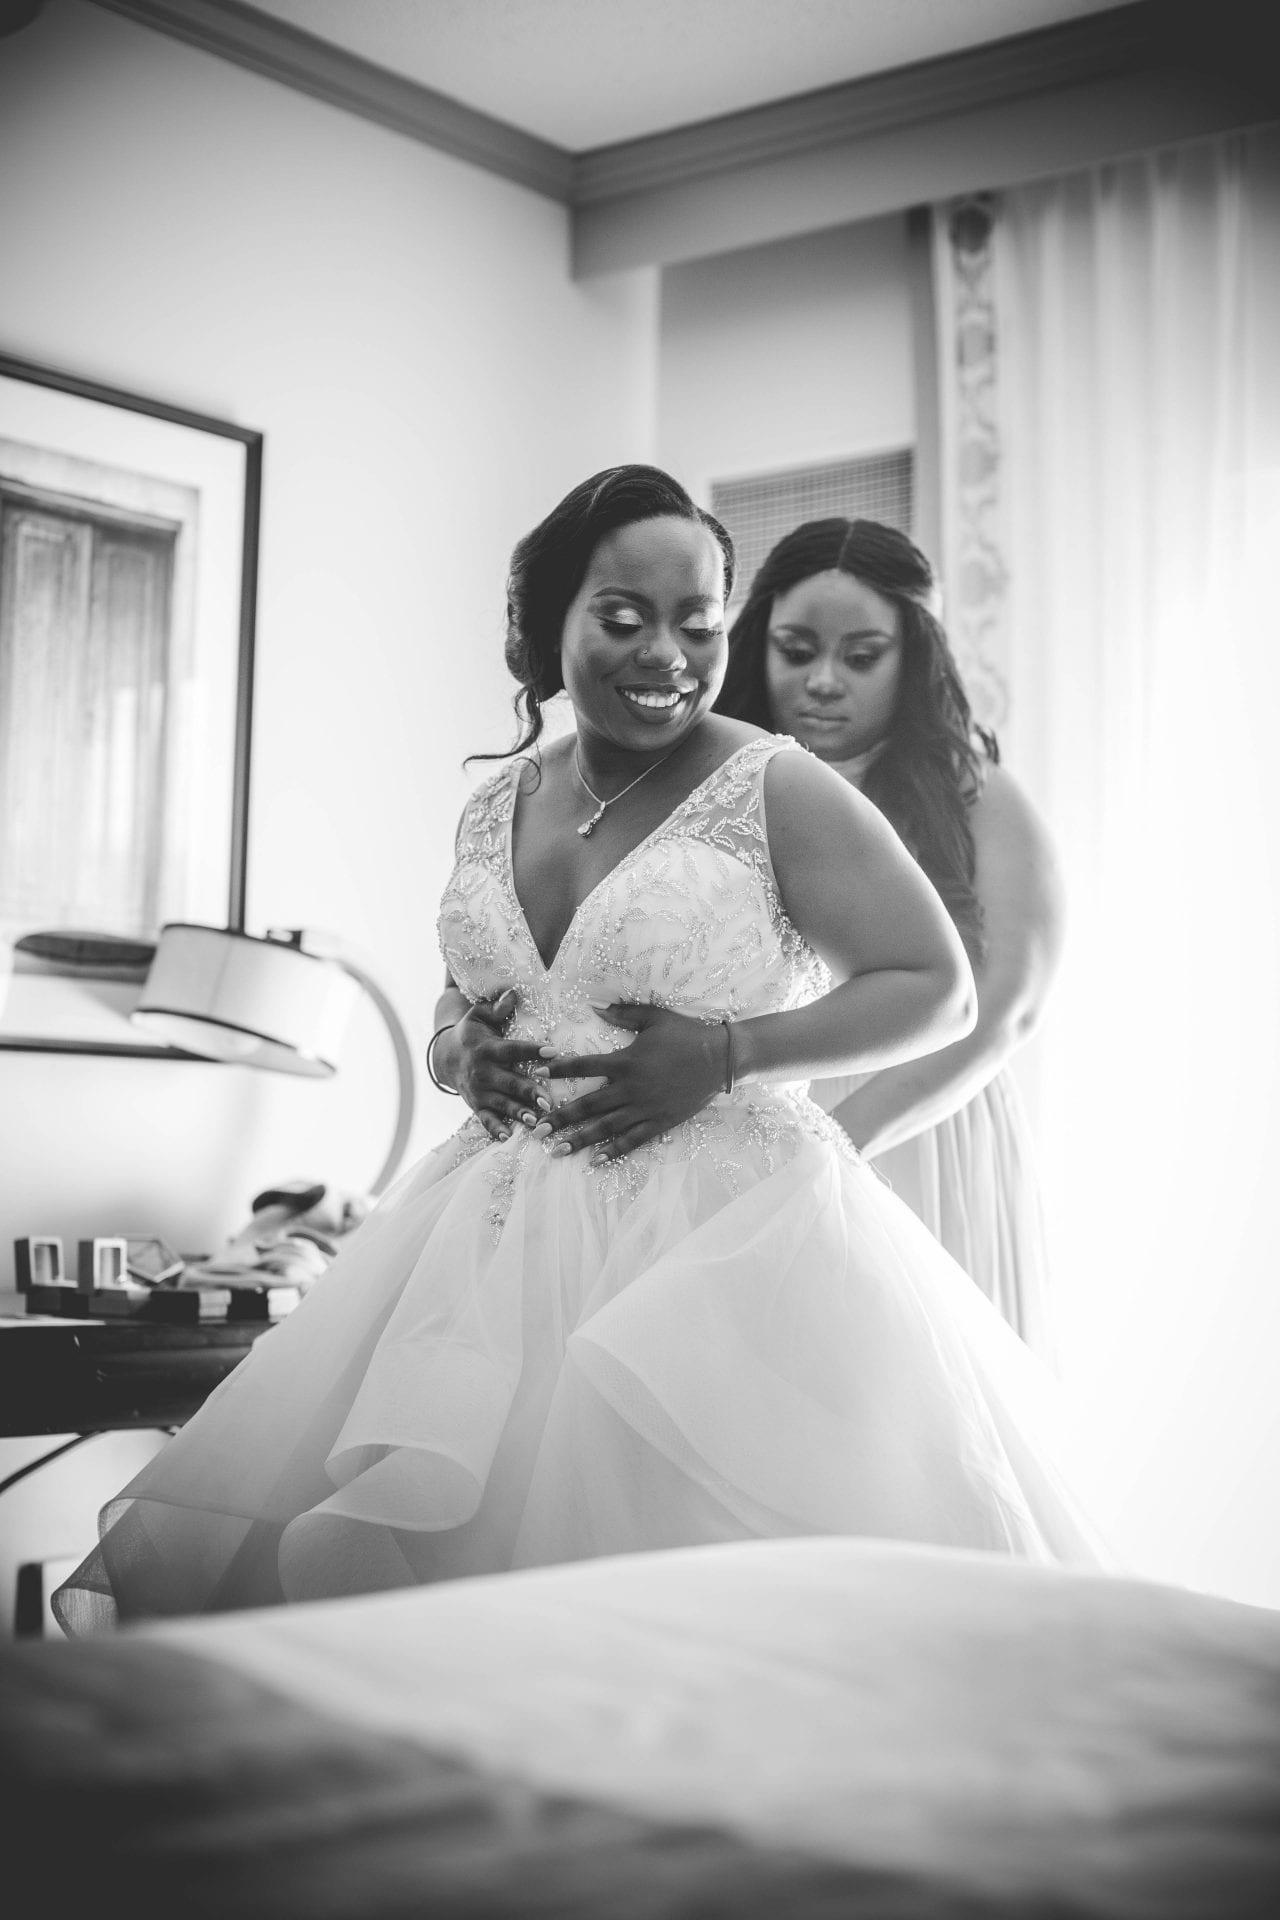 Onyema wedding La Cantera dressing